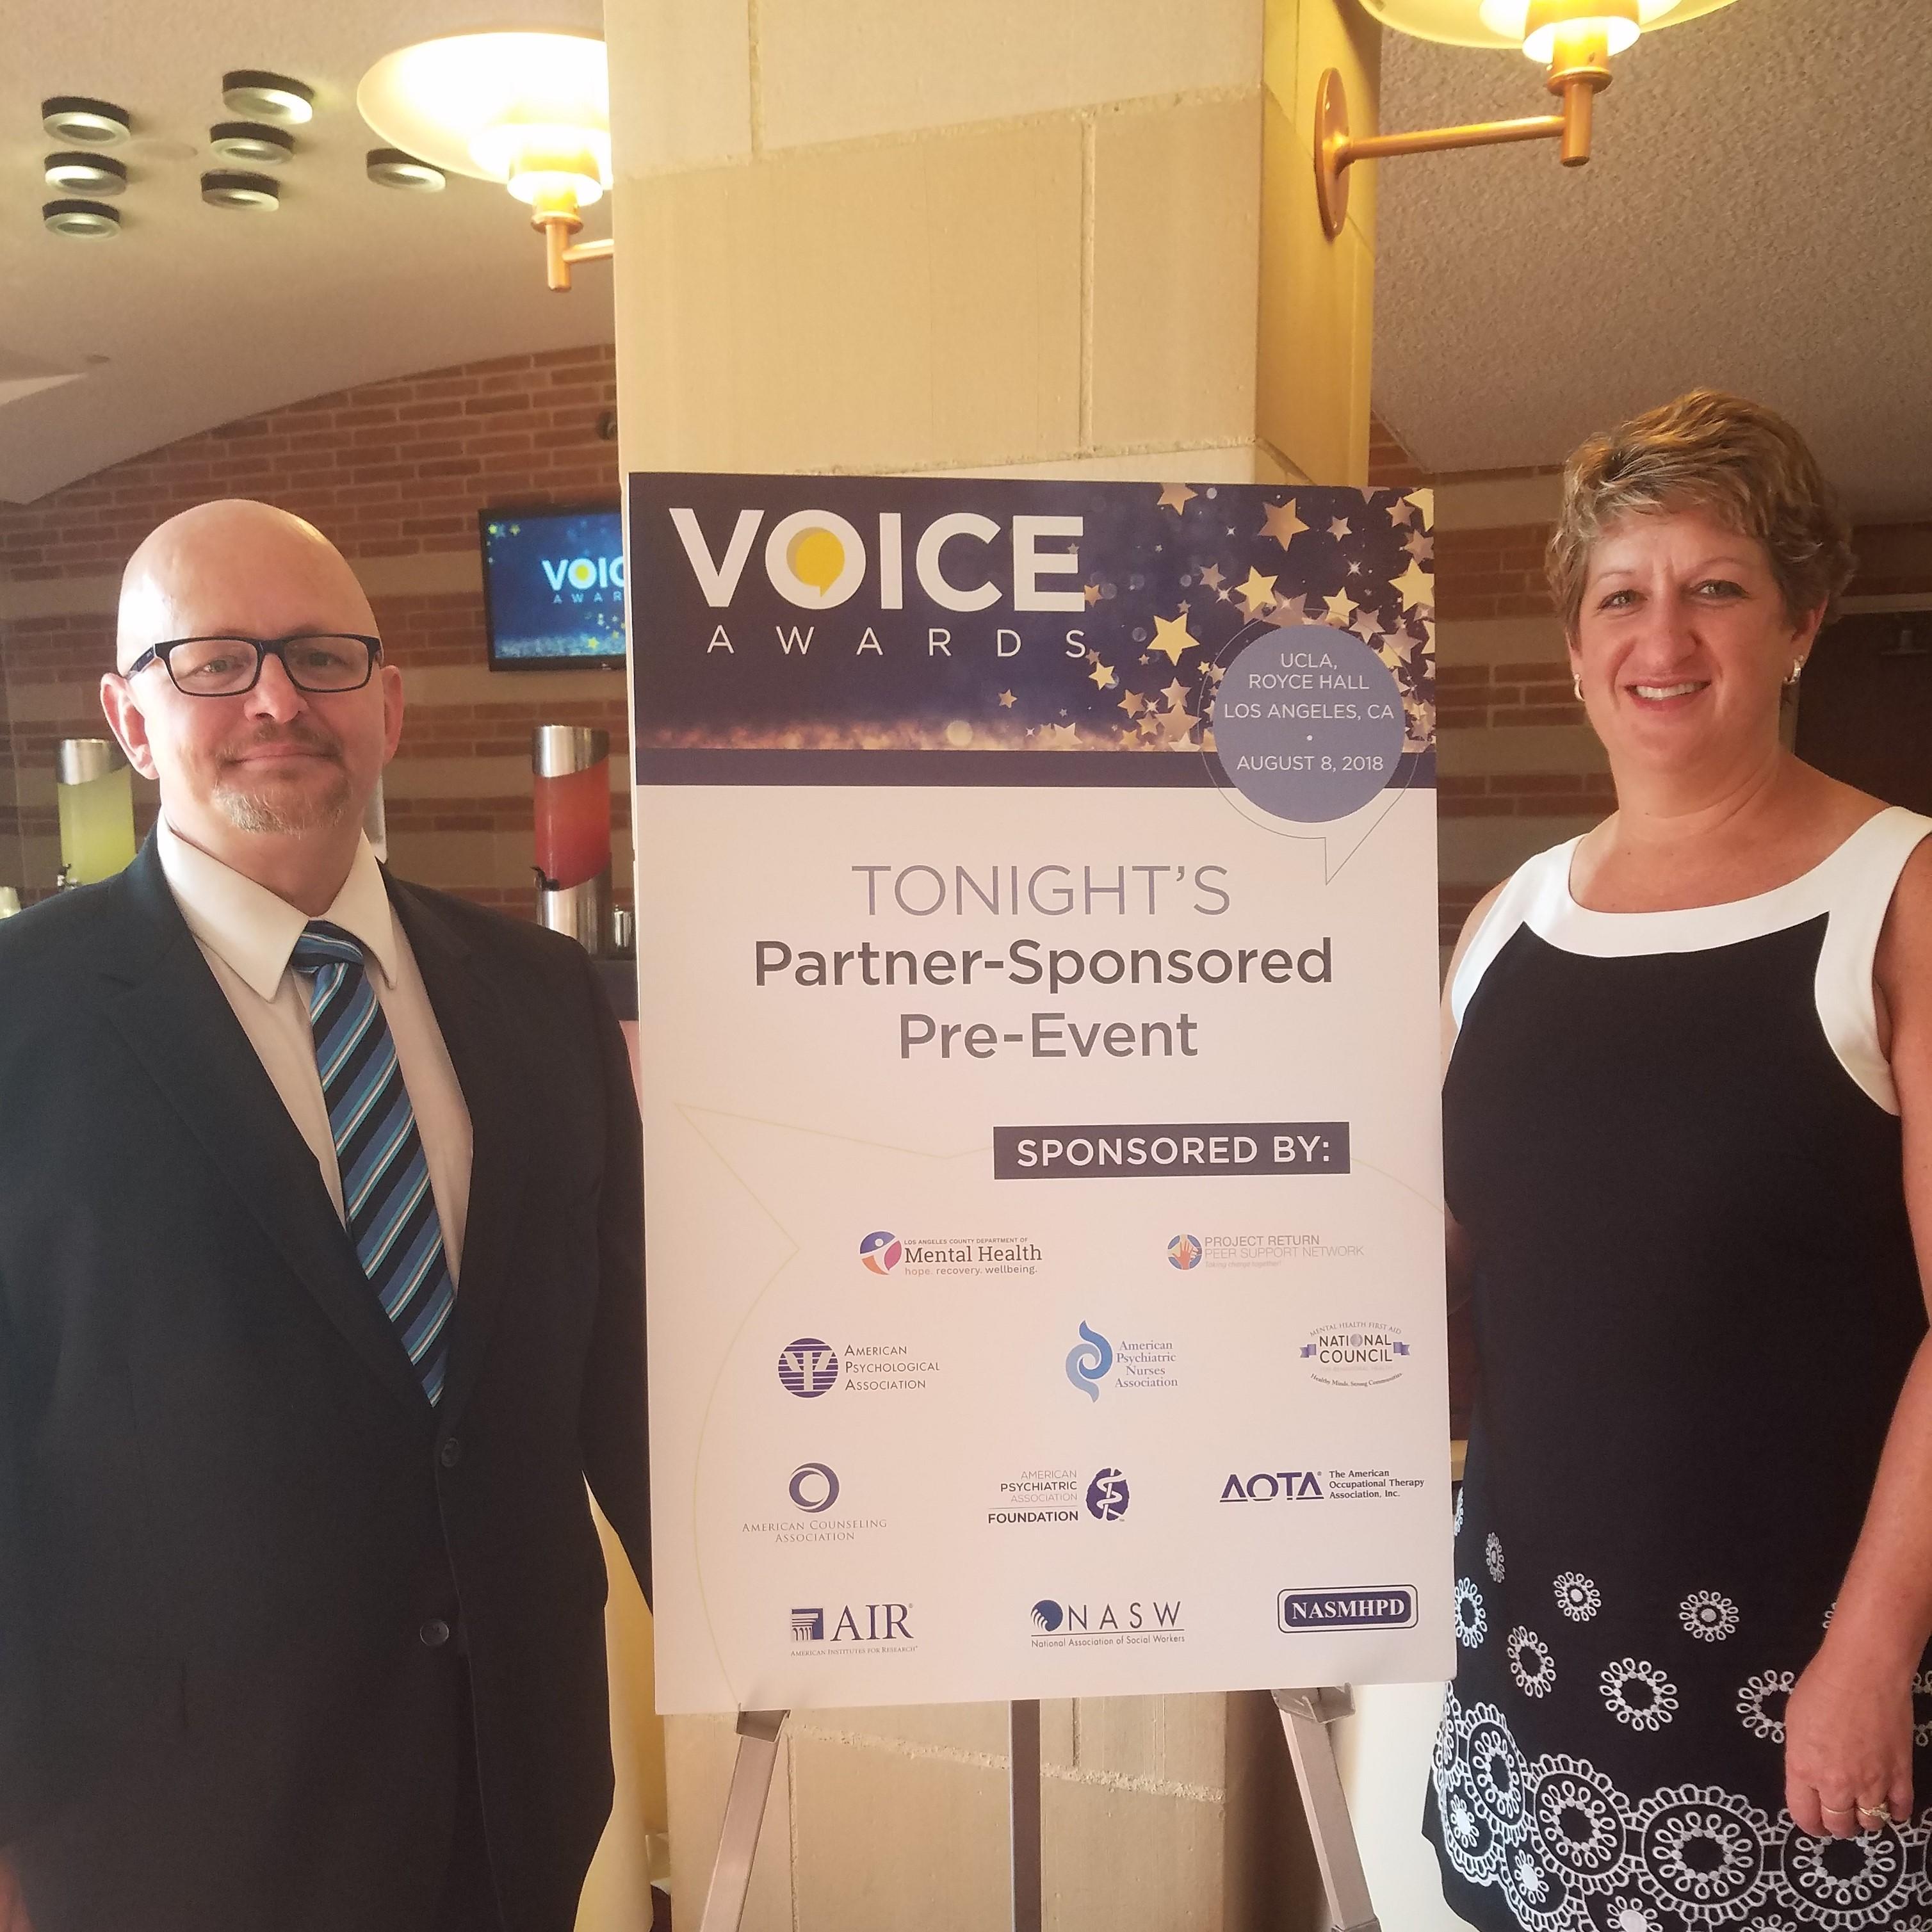 David Stoecker Wins 2018 SAMHSA Voice Awards